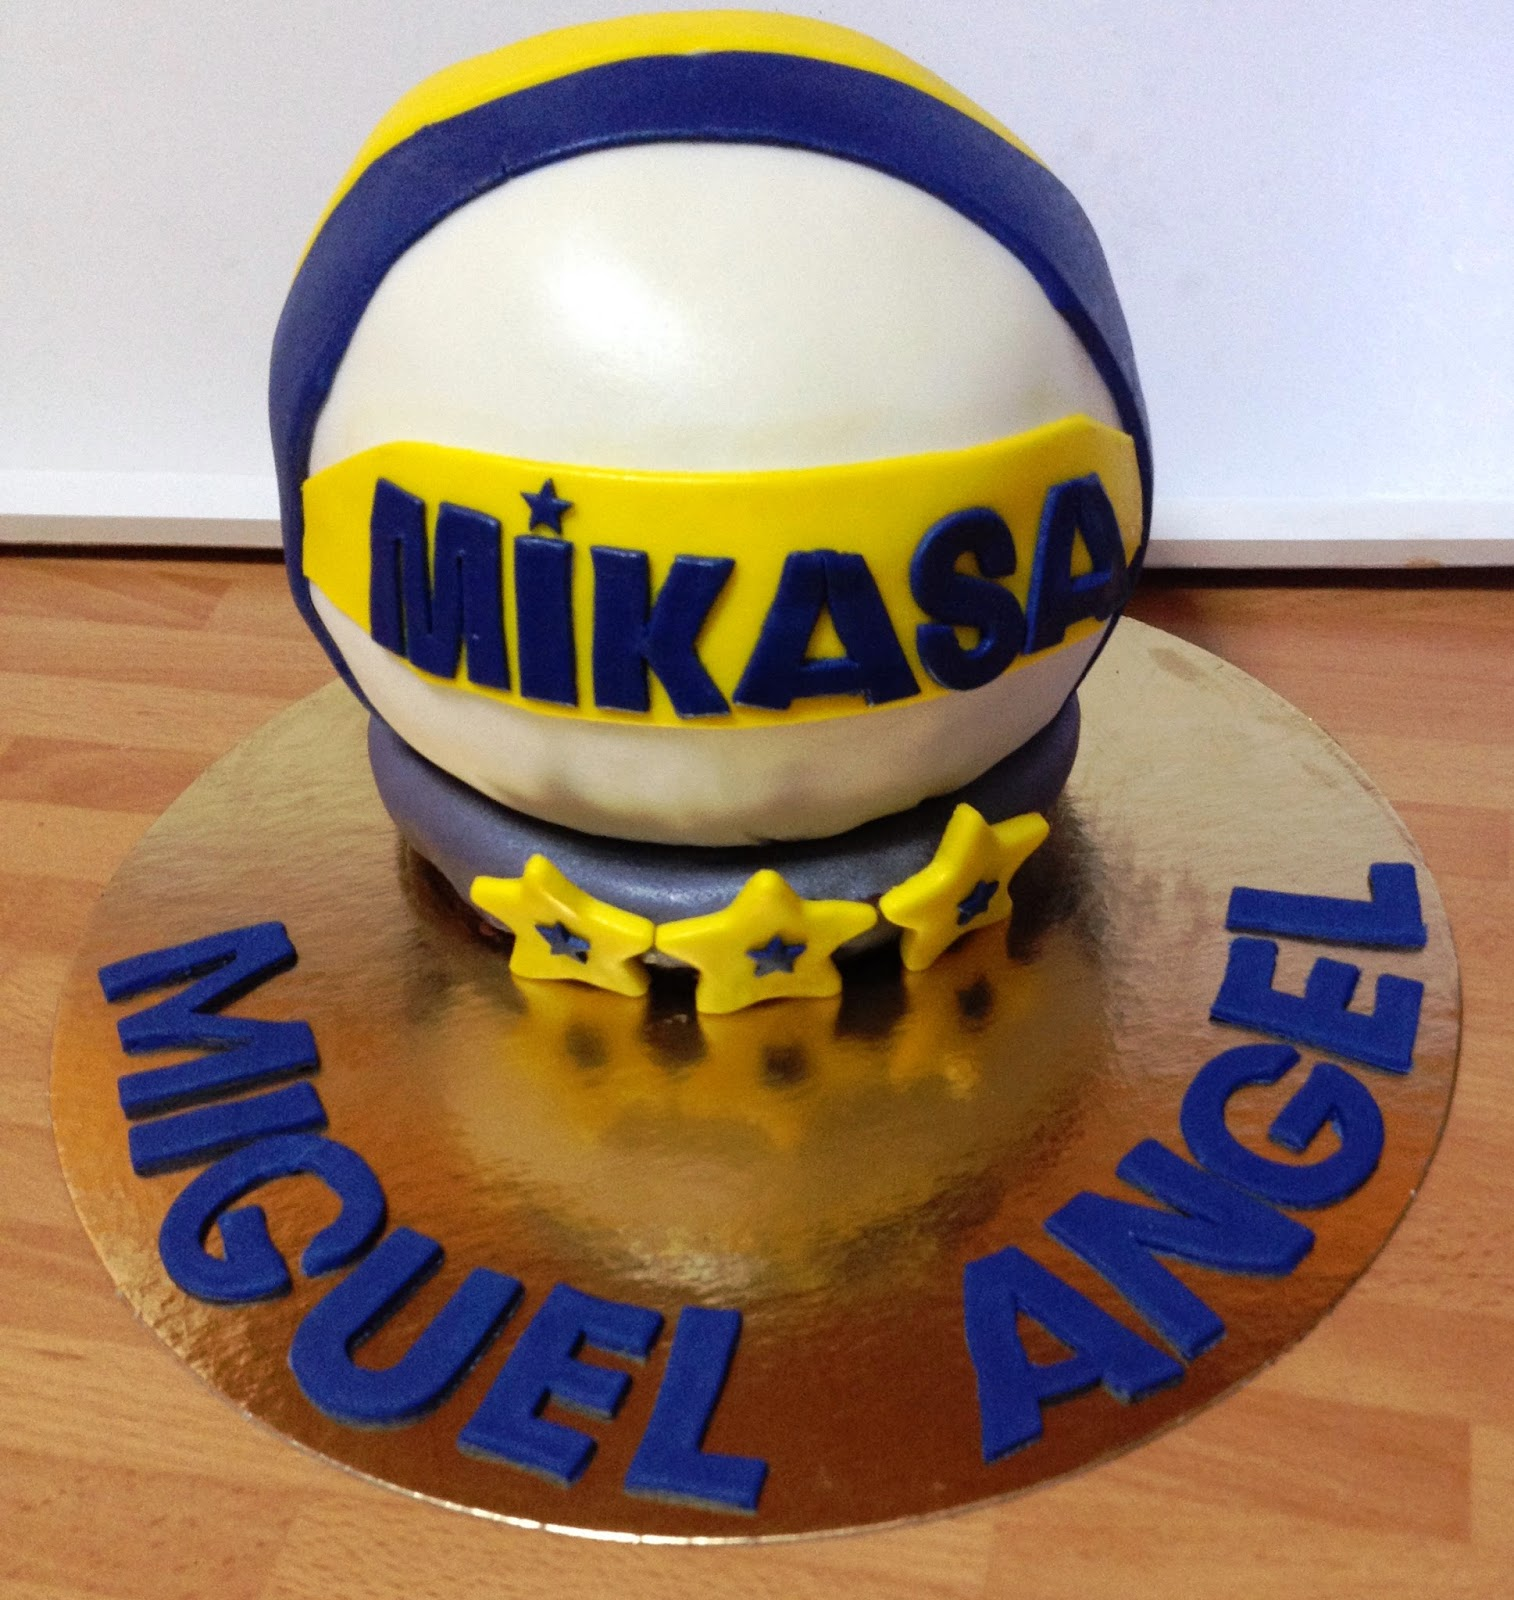 tarta pelota de voley;  tarta bola; tarta pelota; tarta fondant pelota; tarta balón de boley; tarta voley